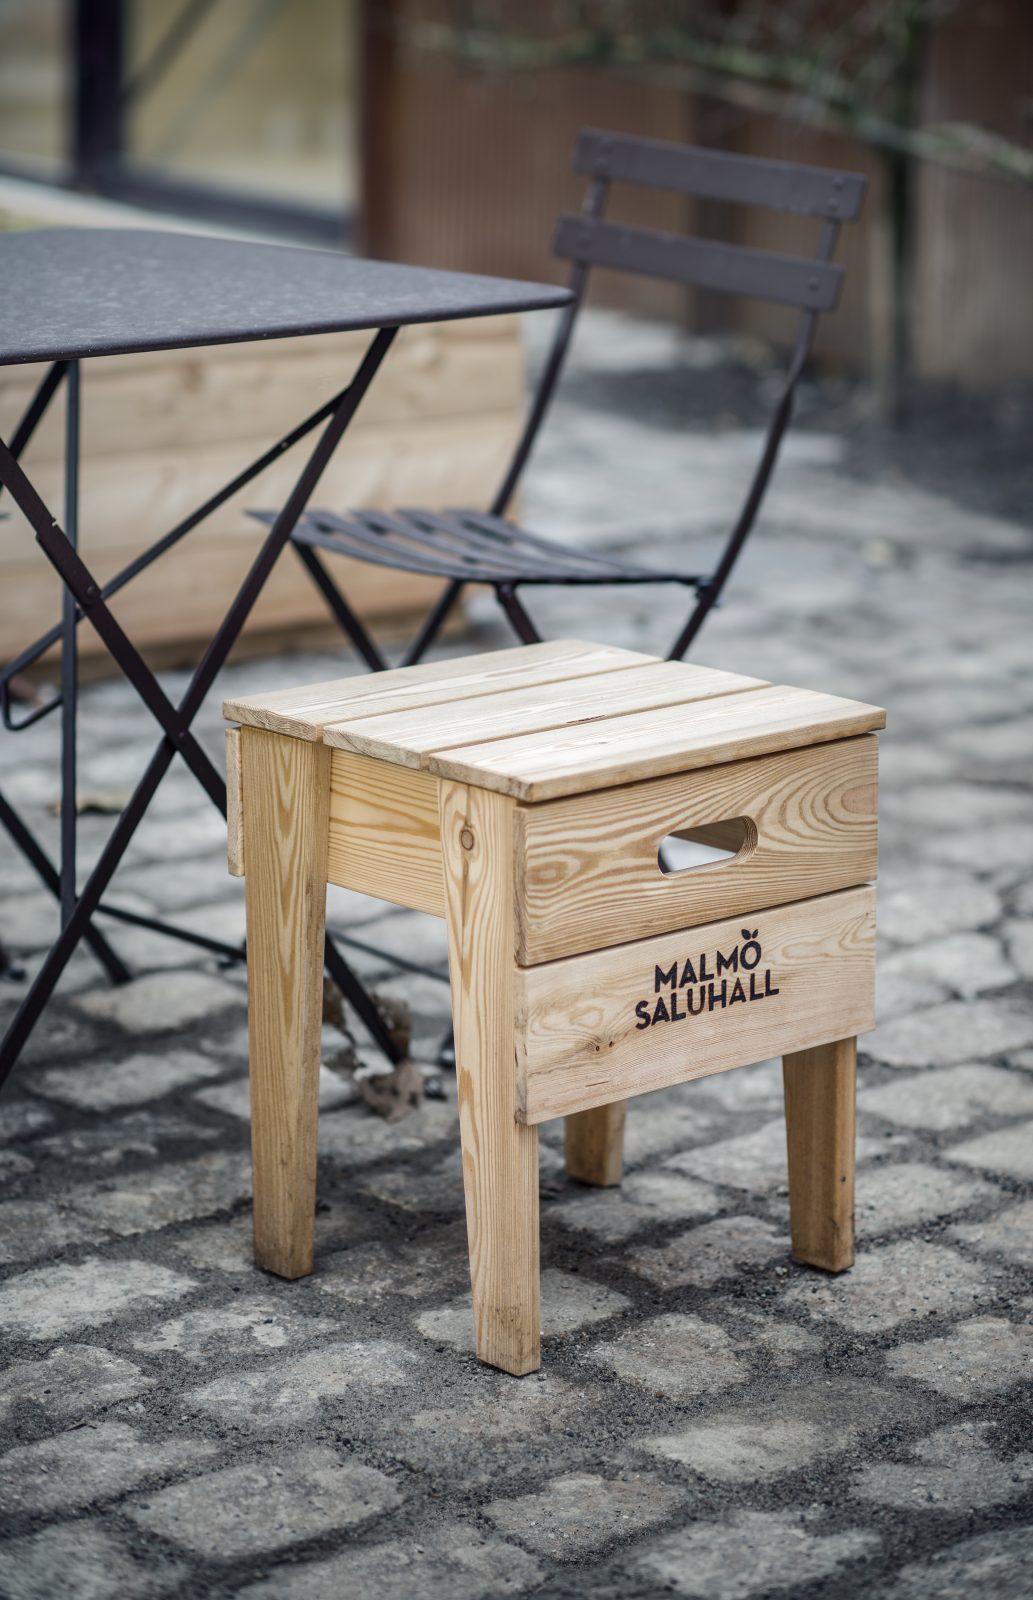 KjellanderSjoberg Malmö Saluhall Chair 2324x3600px